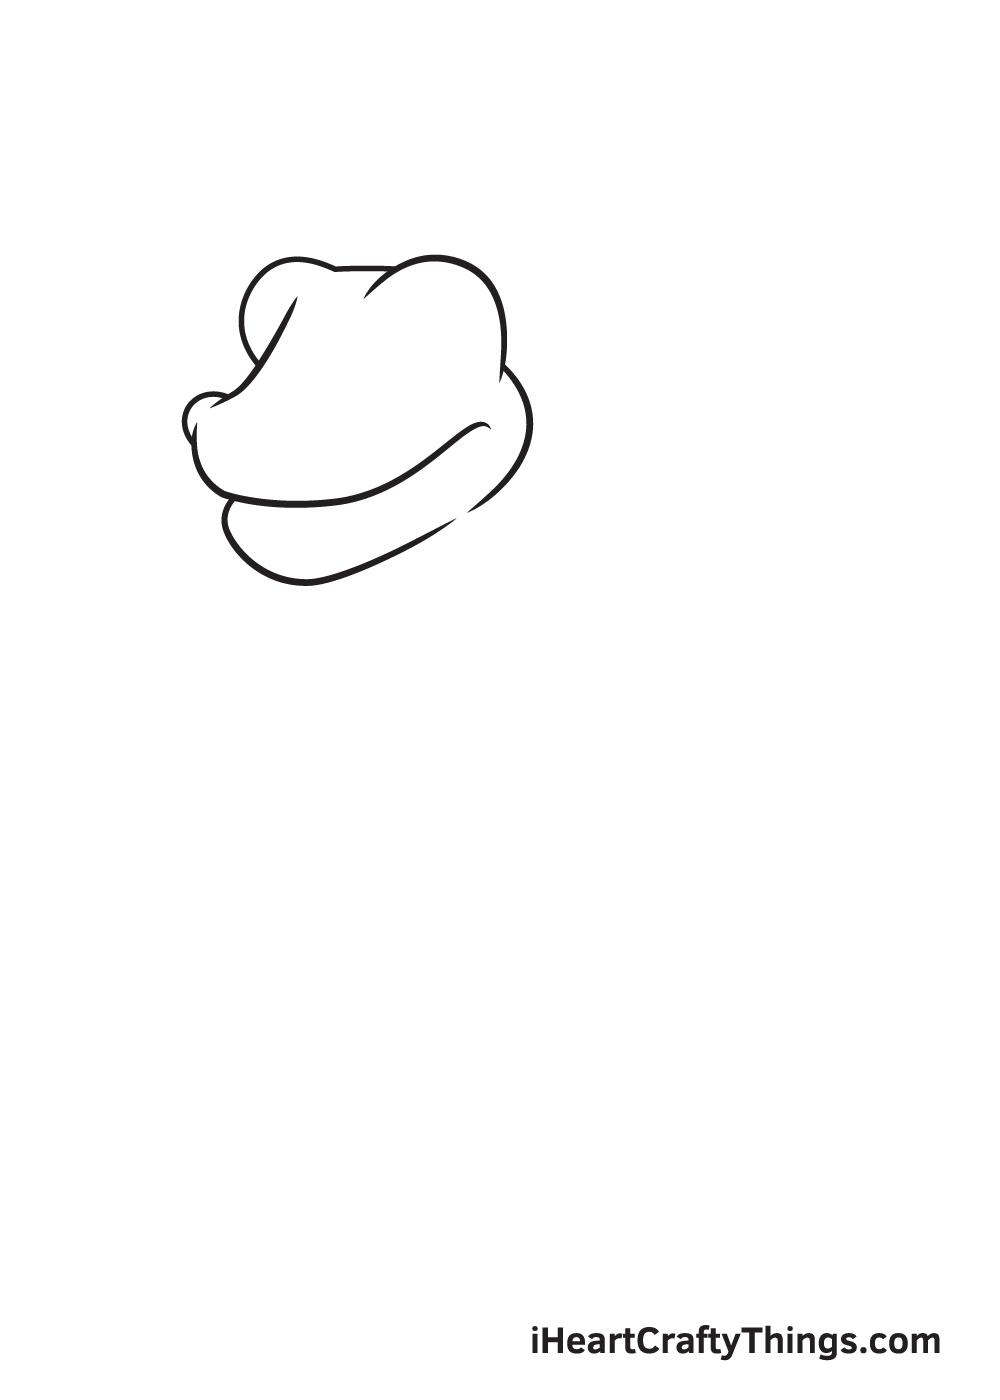 Dragon Drawing – Step 1